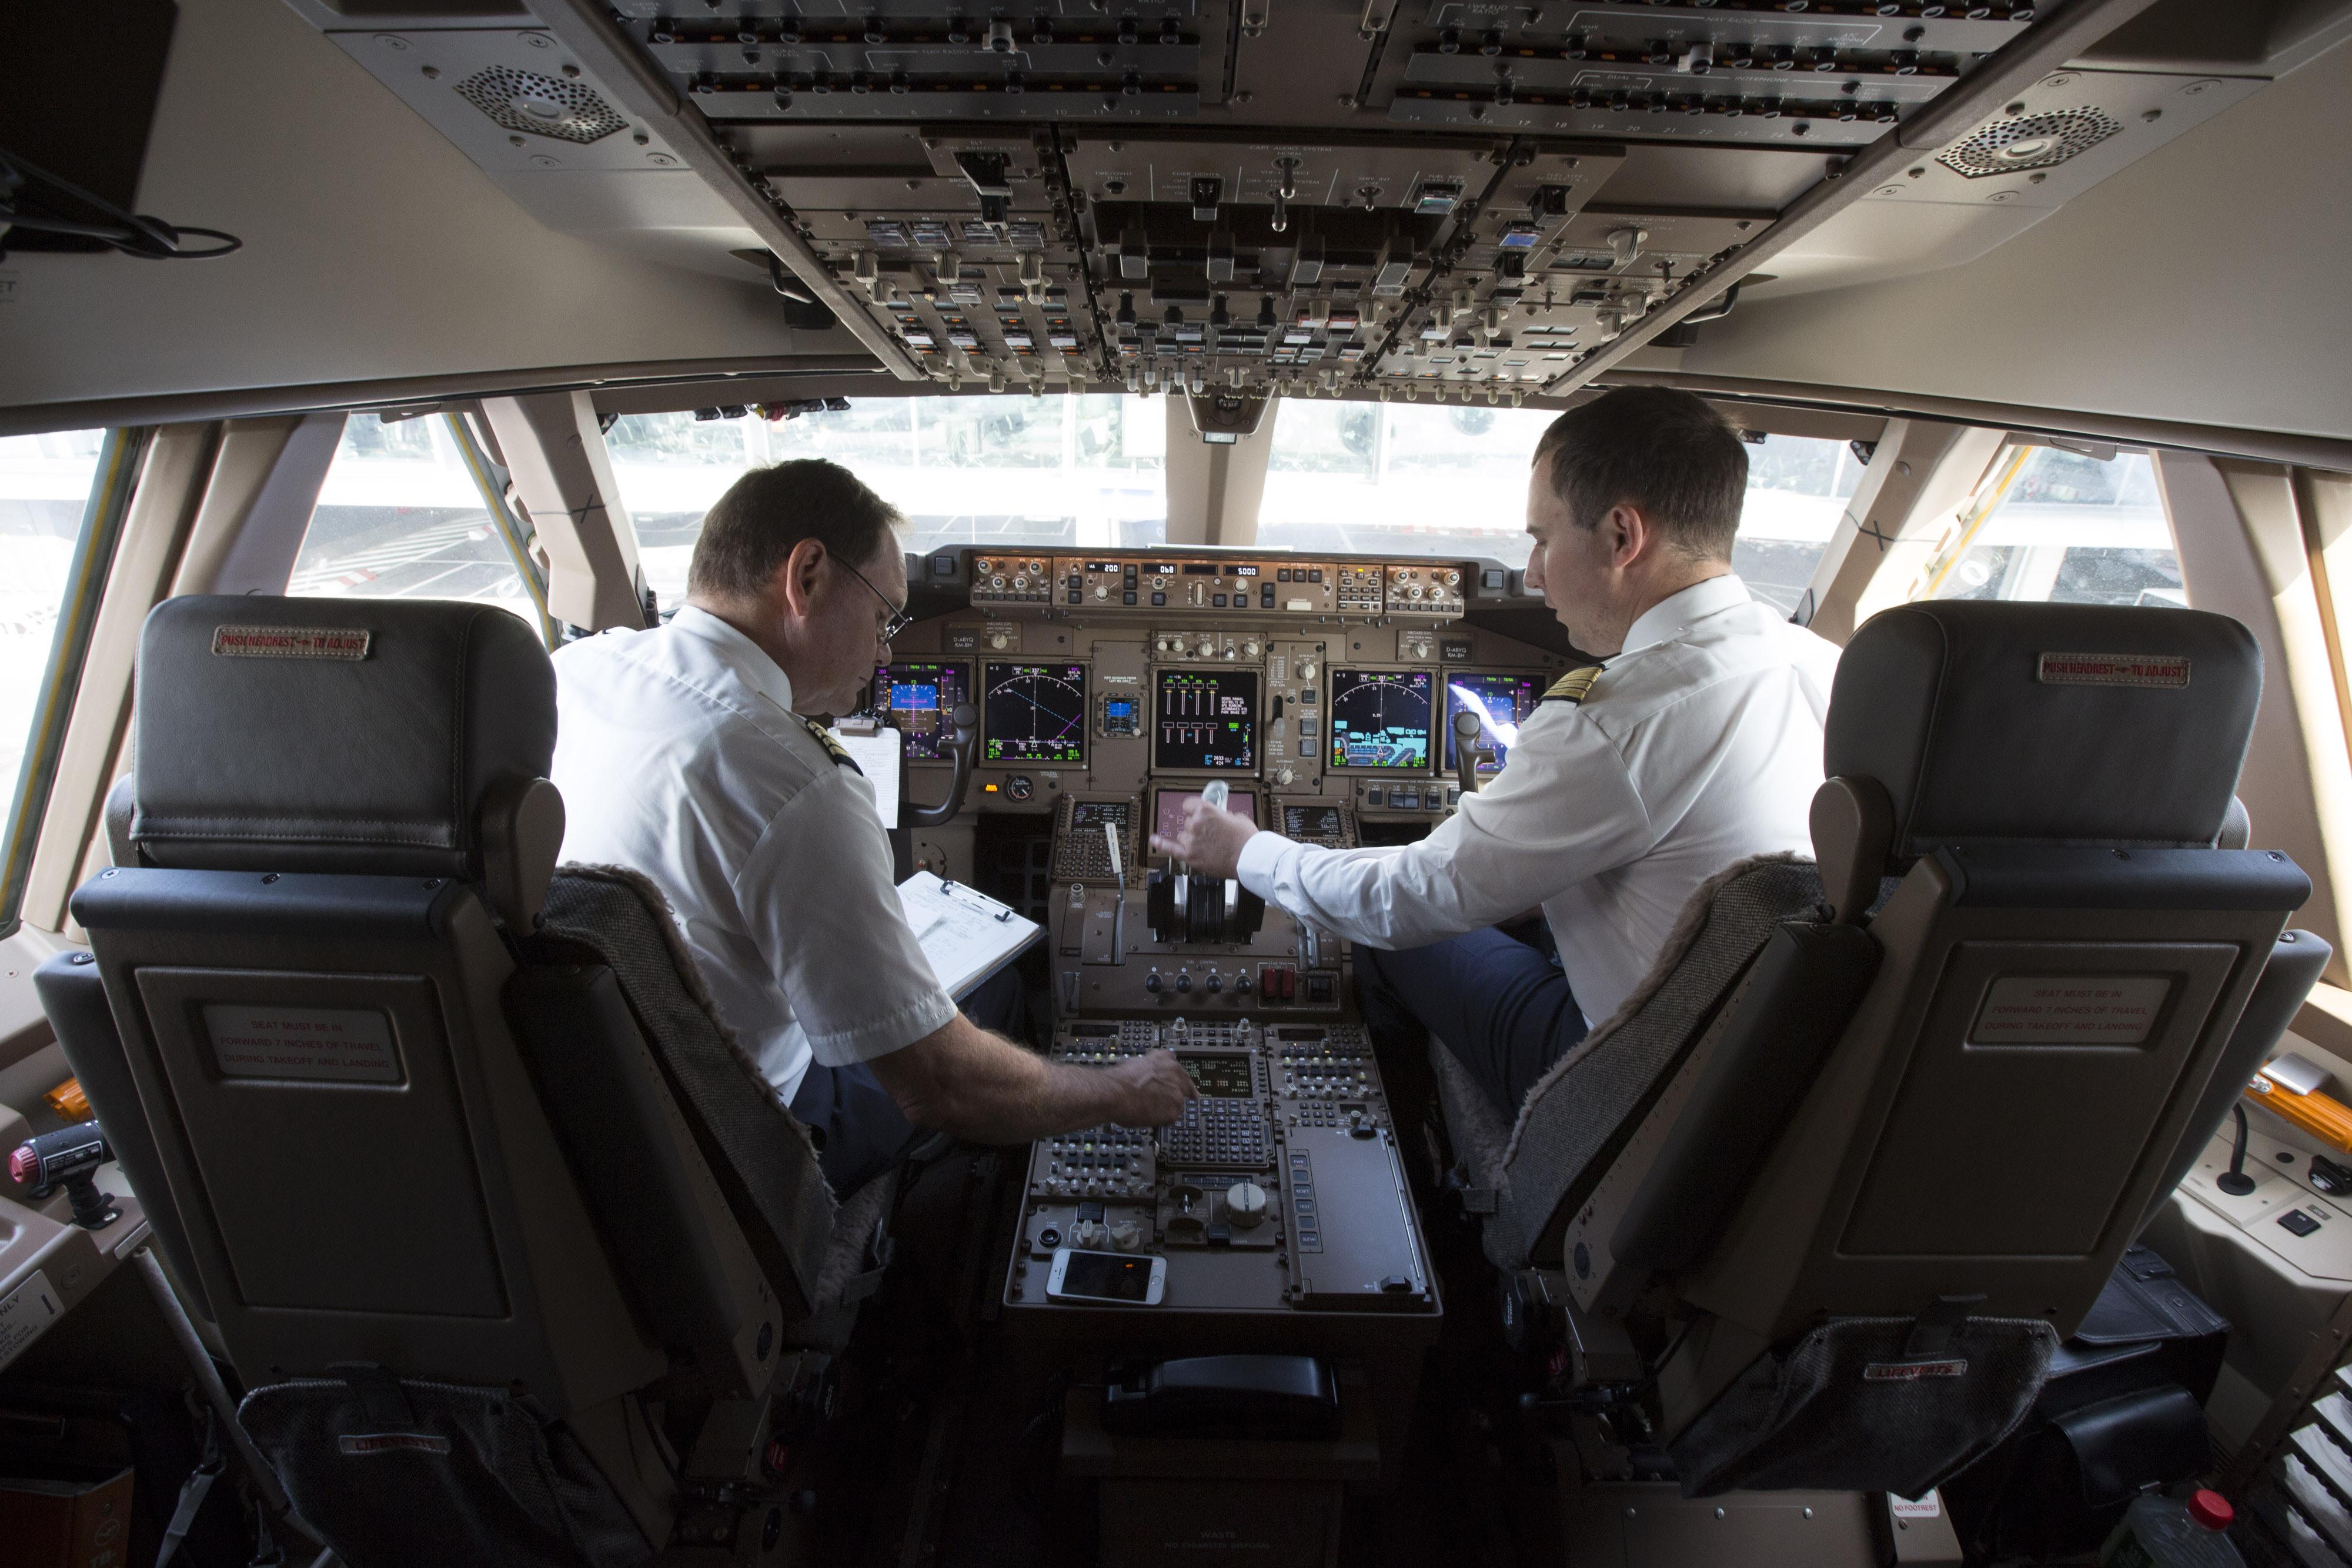 A Deutsche Lufthansa AG pilot, left, and co-pilot sit in the cockpit of a Boeing 747-8 passenger aircraft on Oct. 2, 2014.